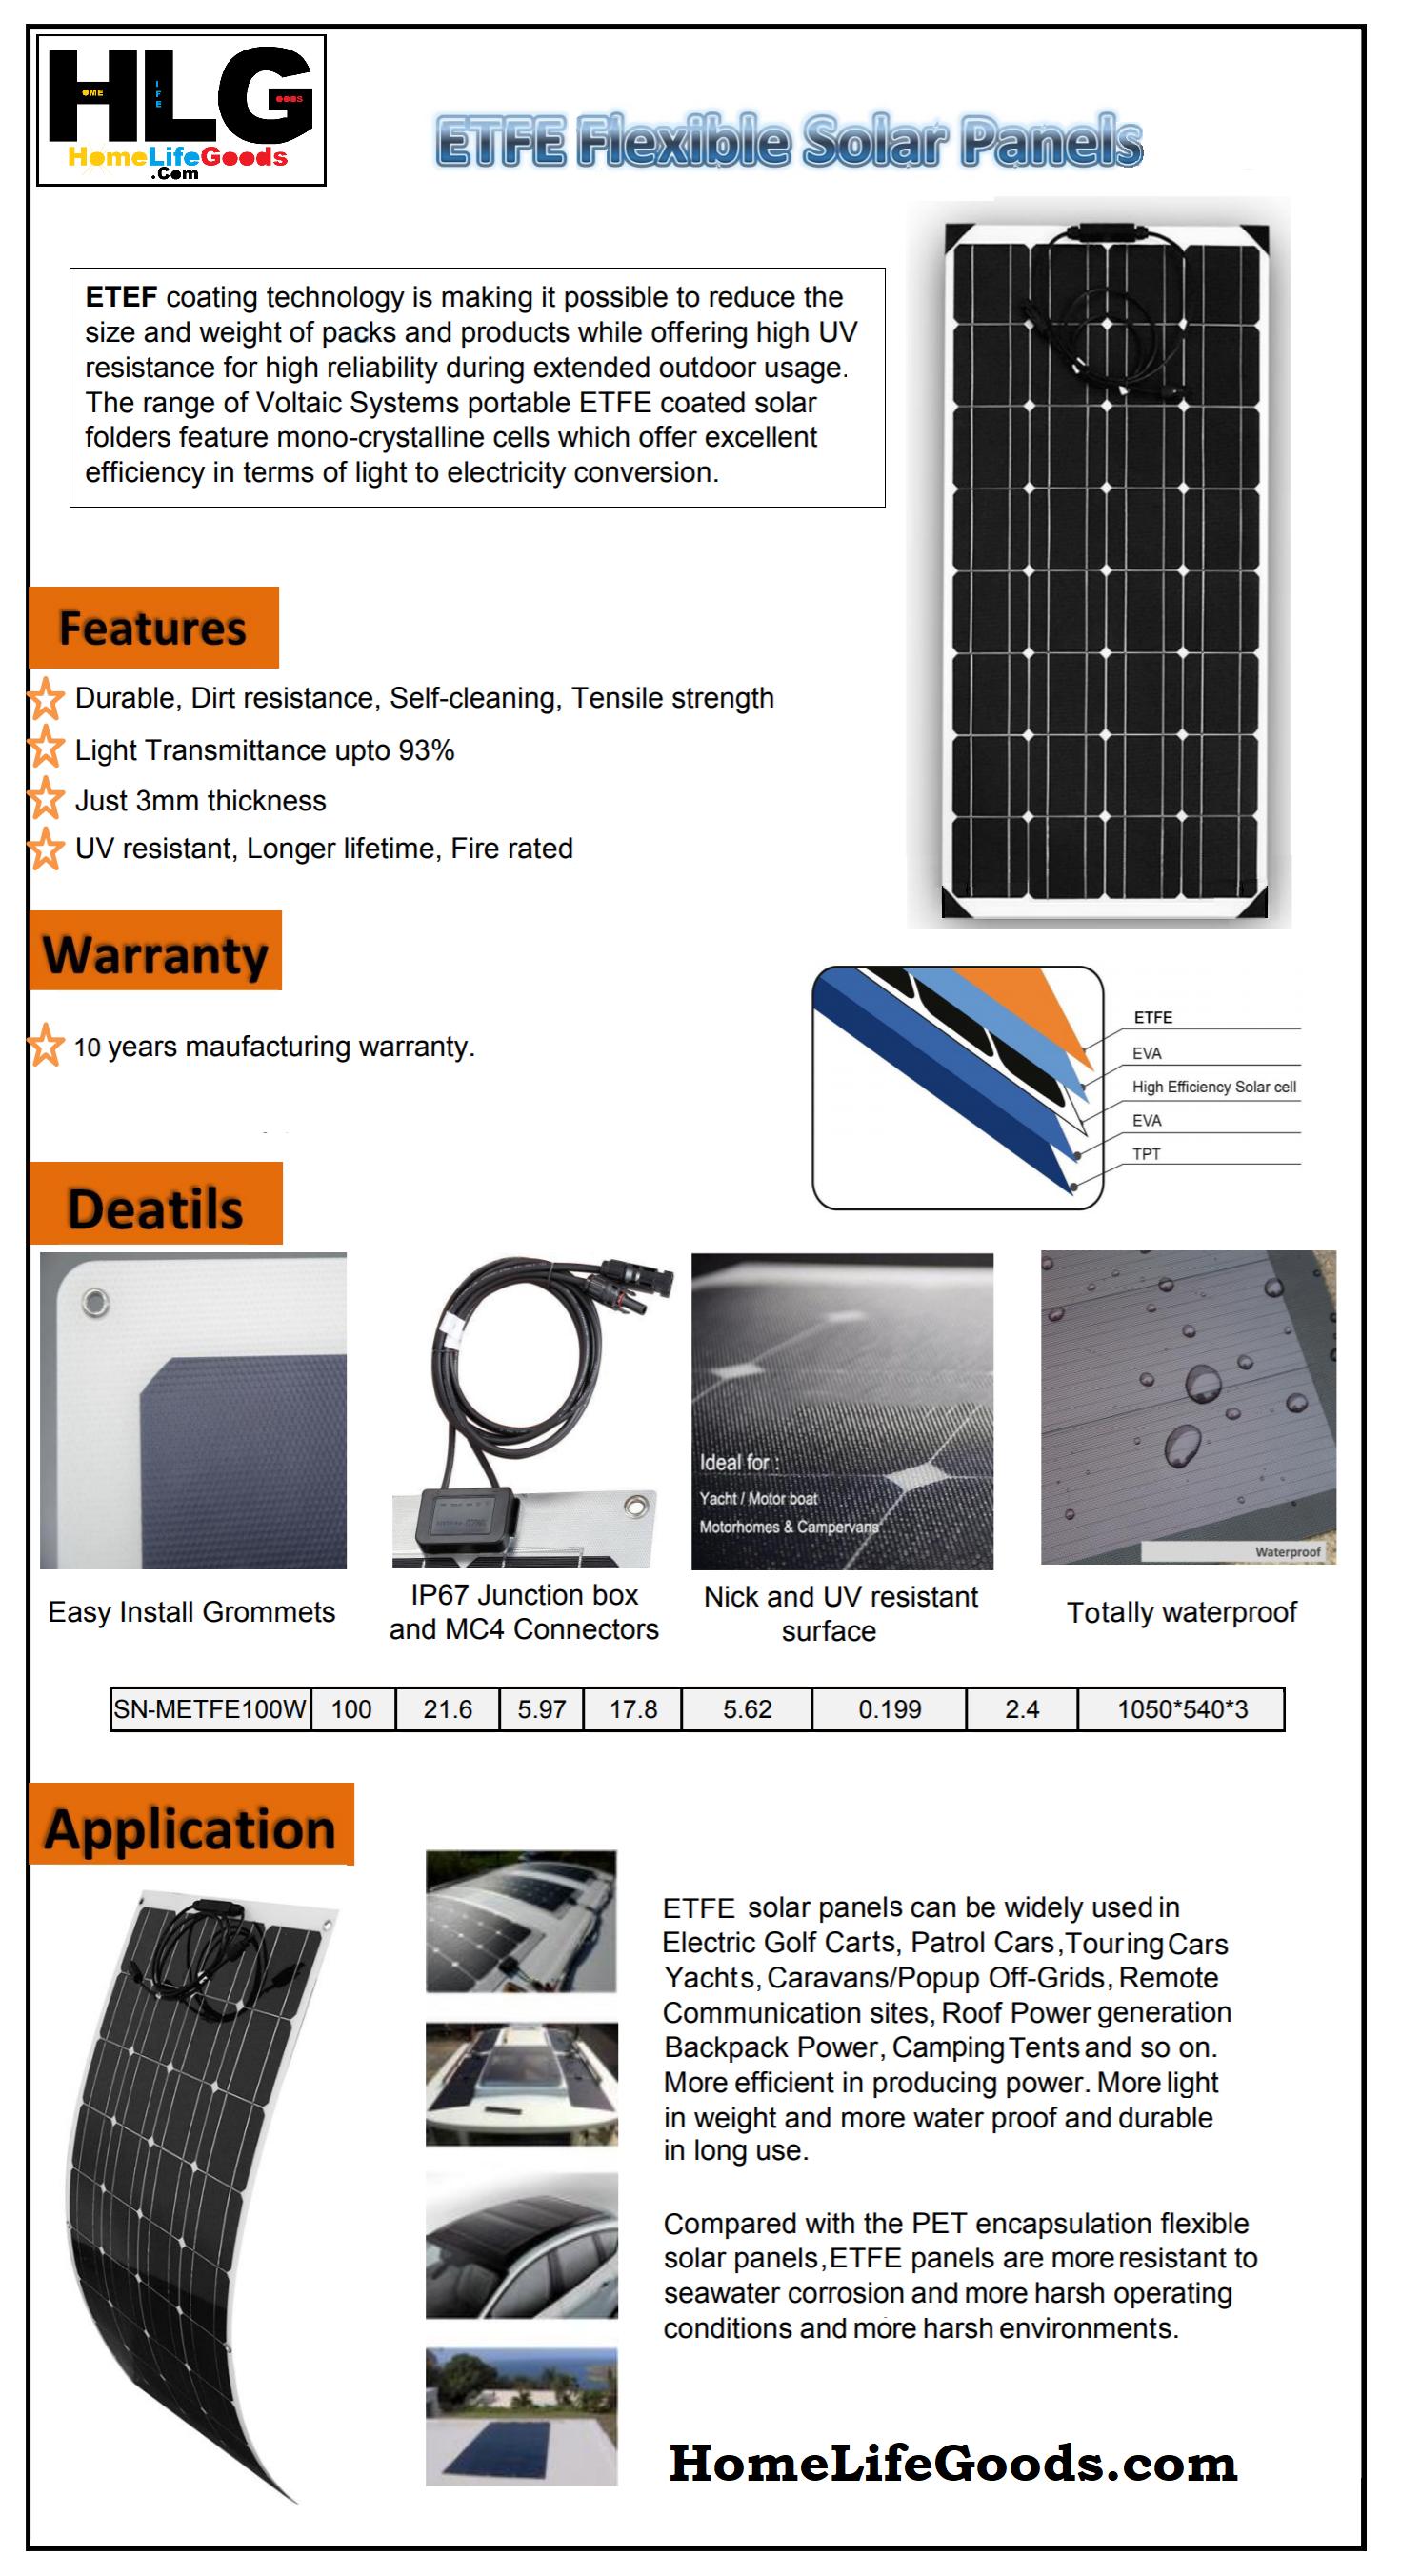 Pet And Etfe Flexible Solar Panels At Homelifegoods Com Free Express Shipping Bulk Deals Quantities Of An Flexible Solar Panels Flexibility Solar Panels